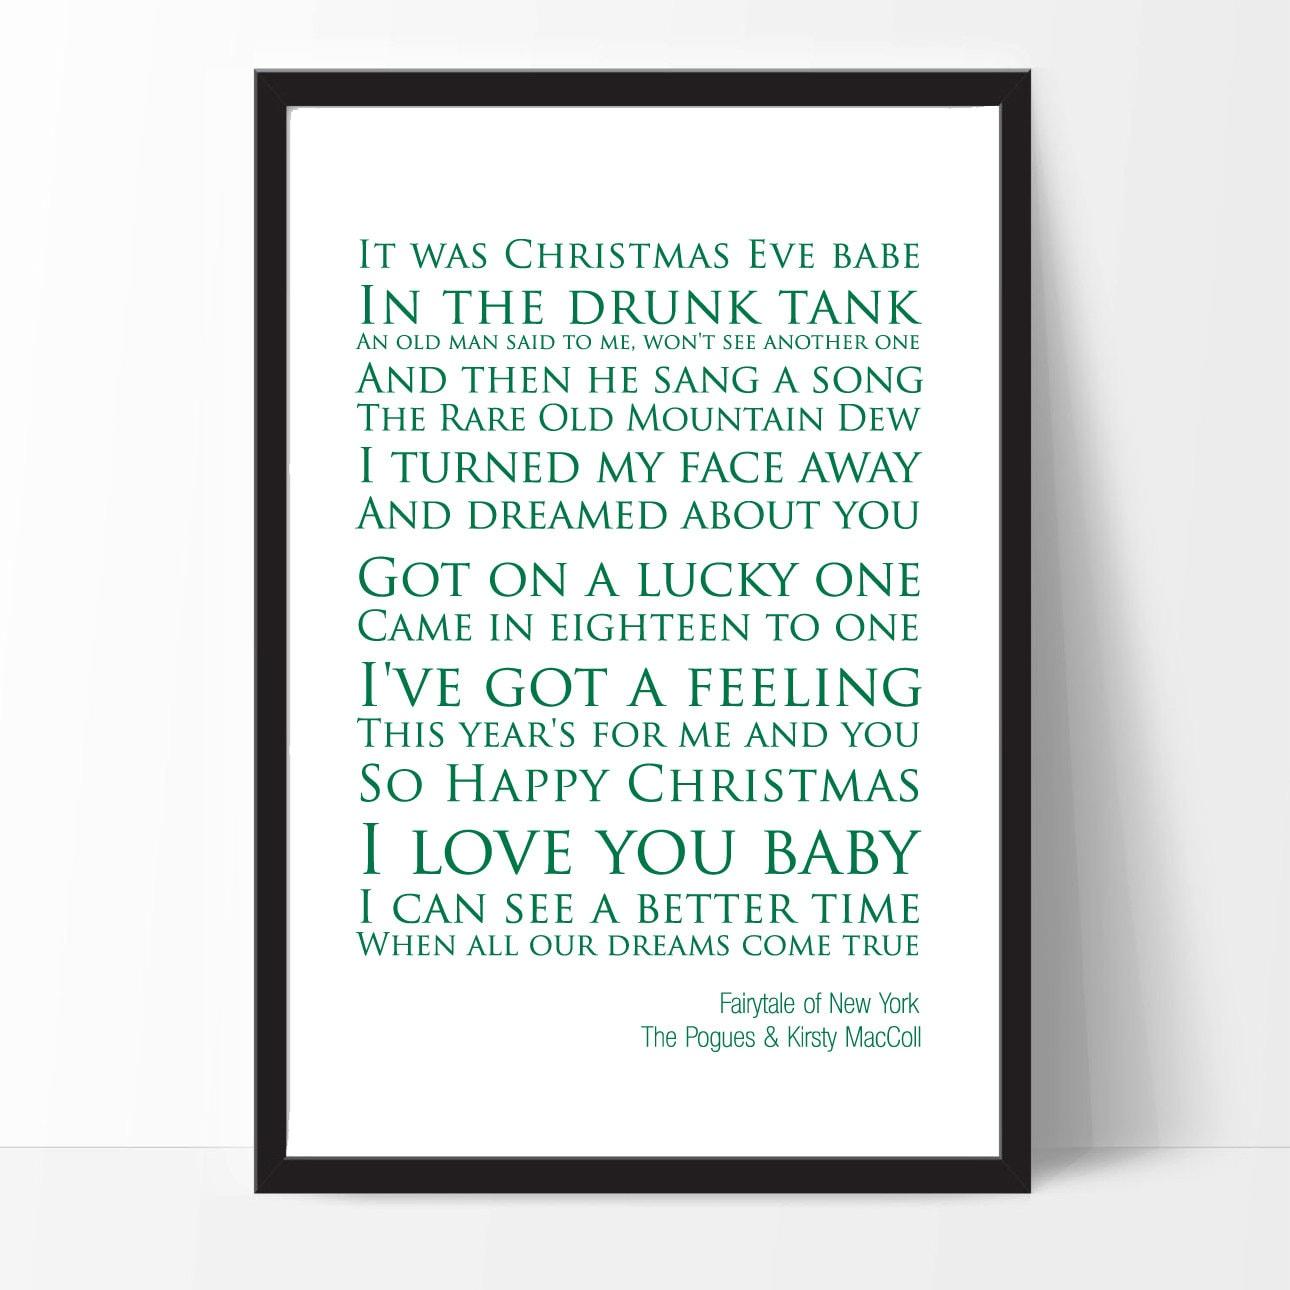 Christmas Song The Gift Lyrics: Fairytale Of New York The Pogues & Kirsty MacColl Lyrics